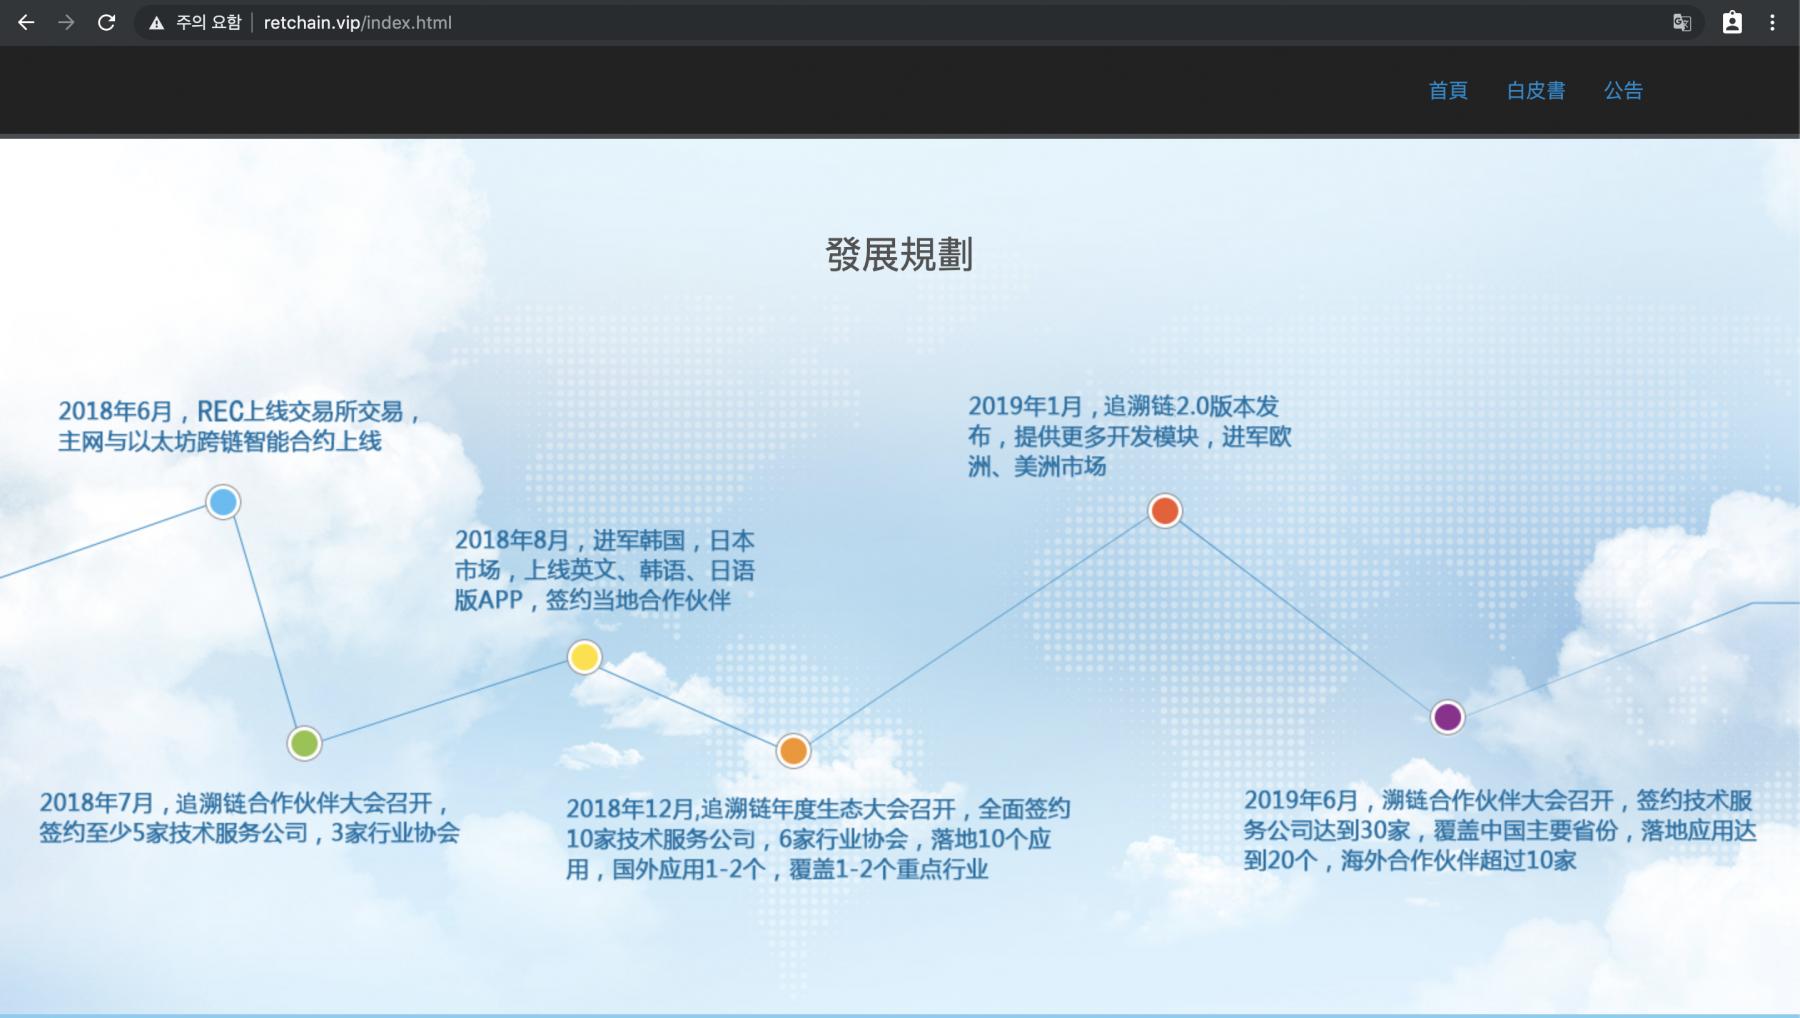 Screenshot of roadmap on RET website